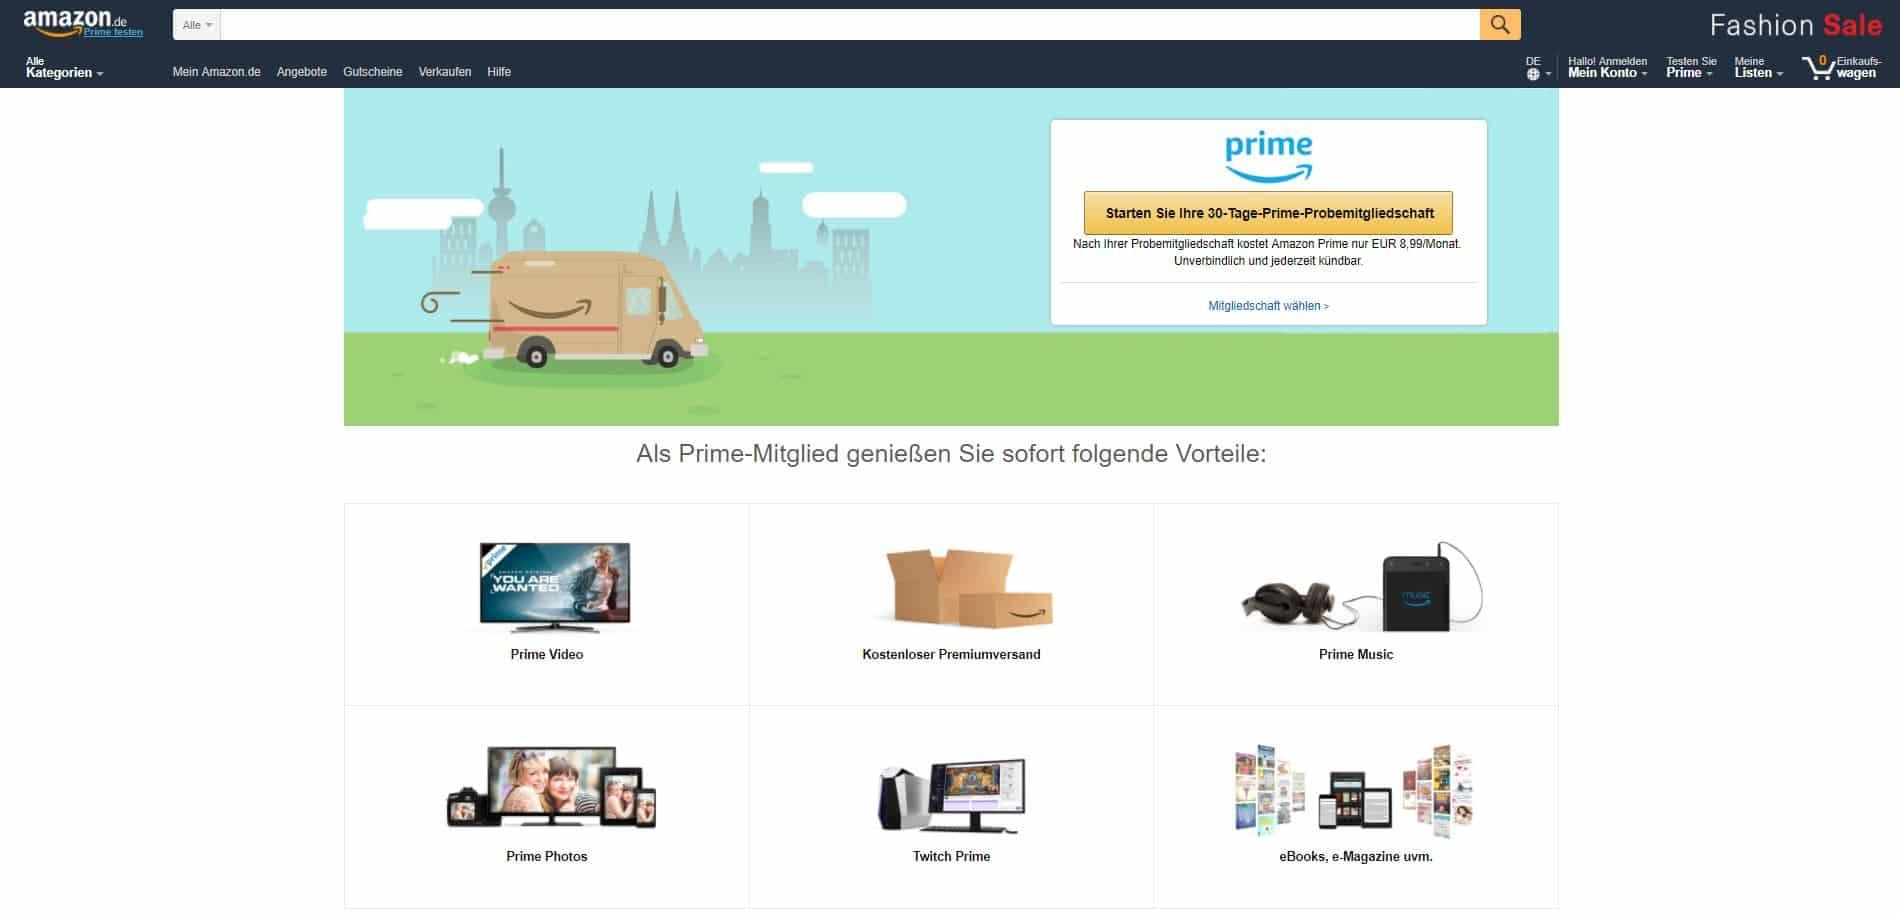 Prime-Vorteile (Grafik von amazon.de)